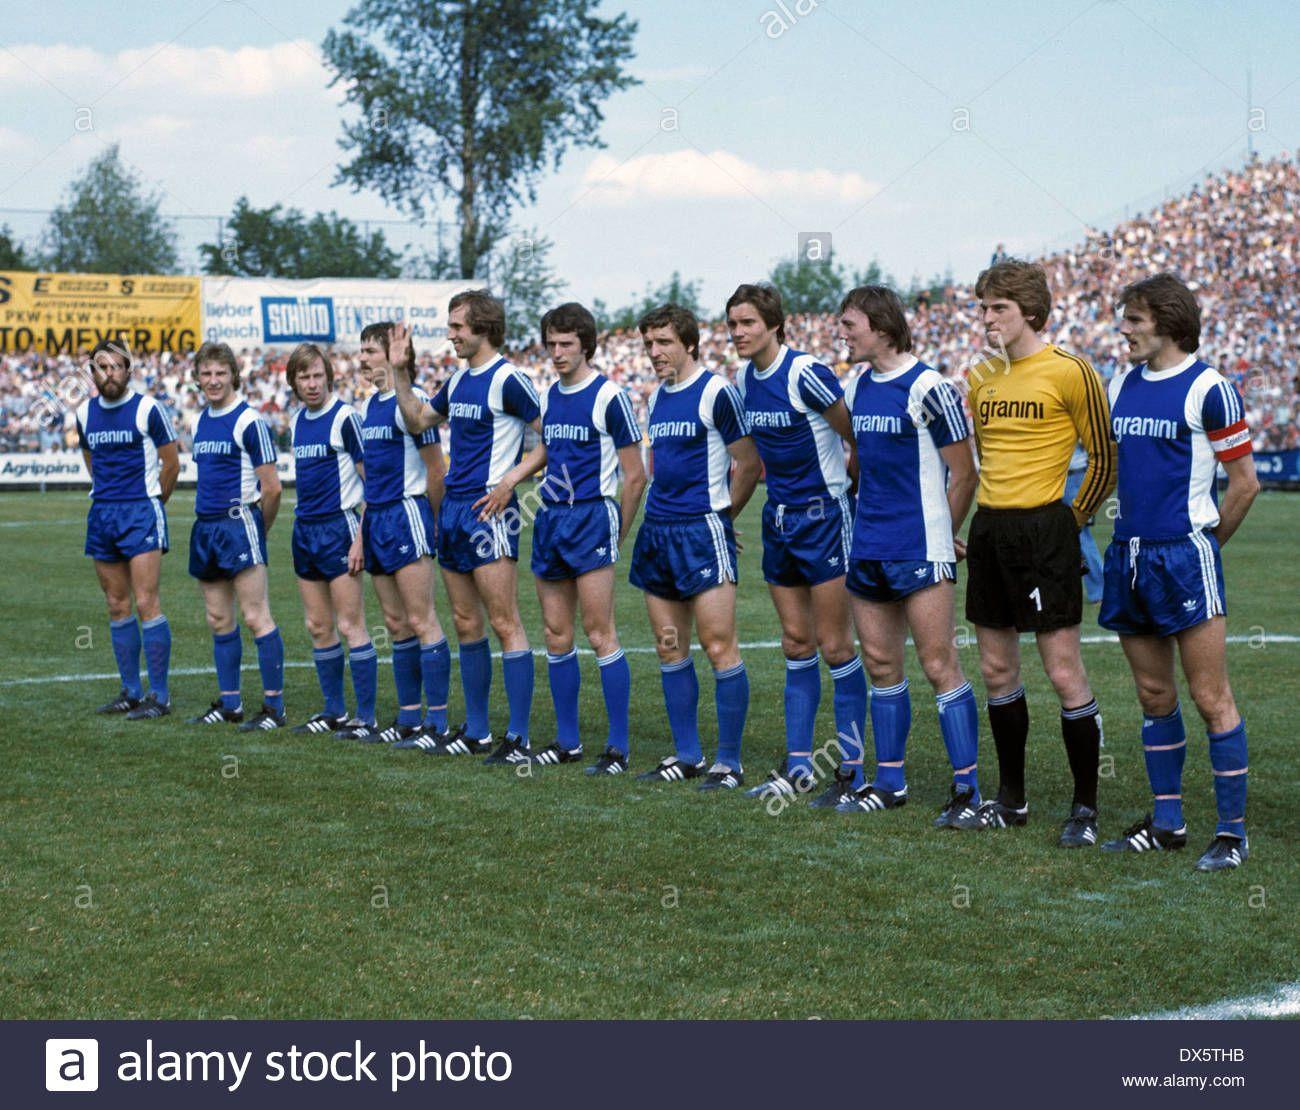 Download This Stock Image Football 2 Bundesliga Nord 2